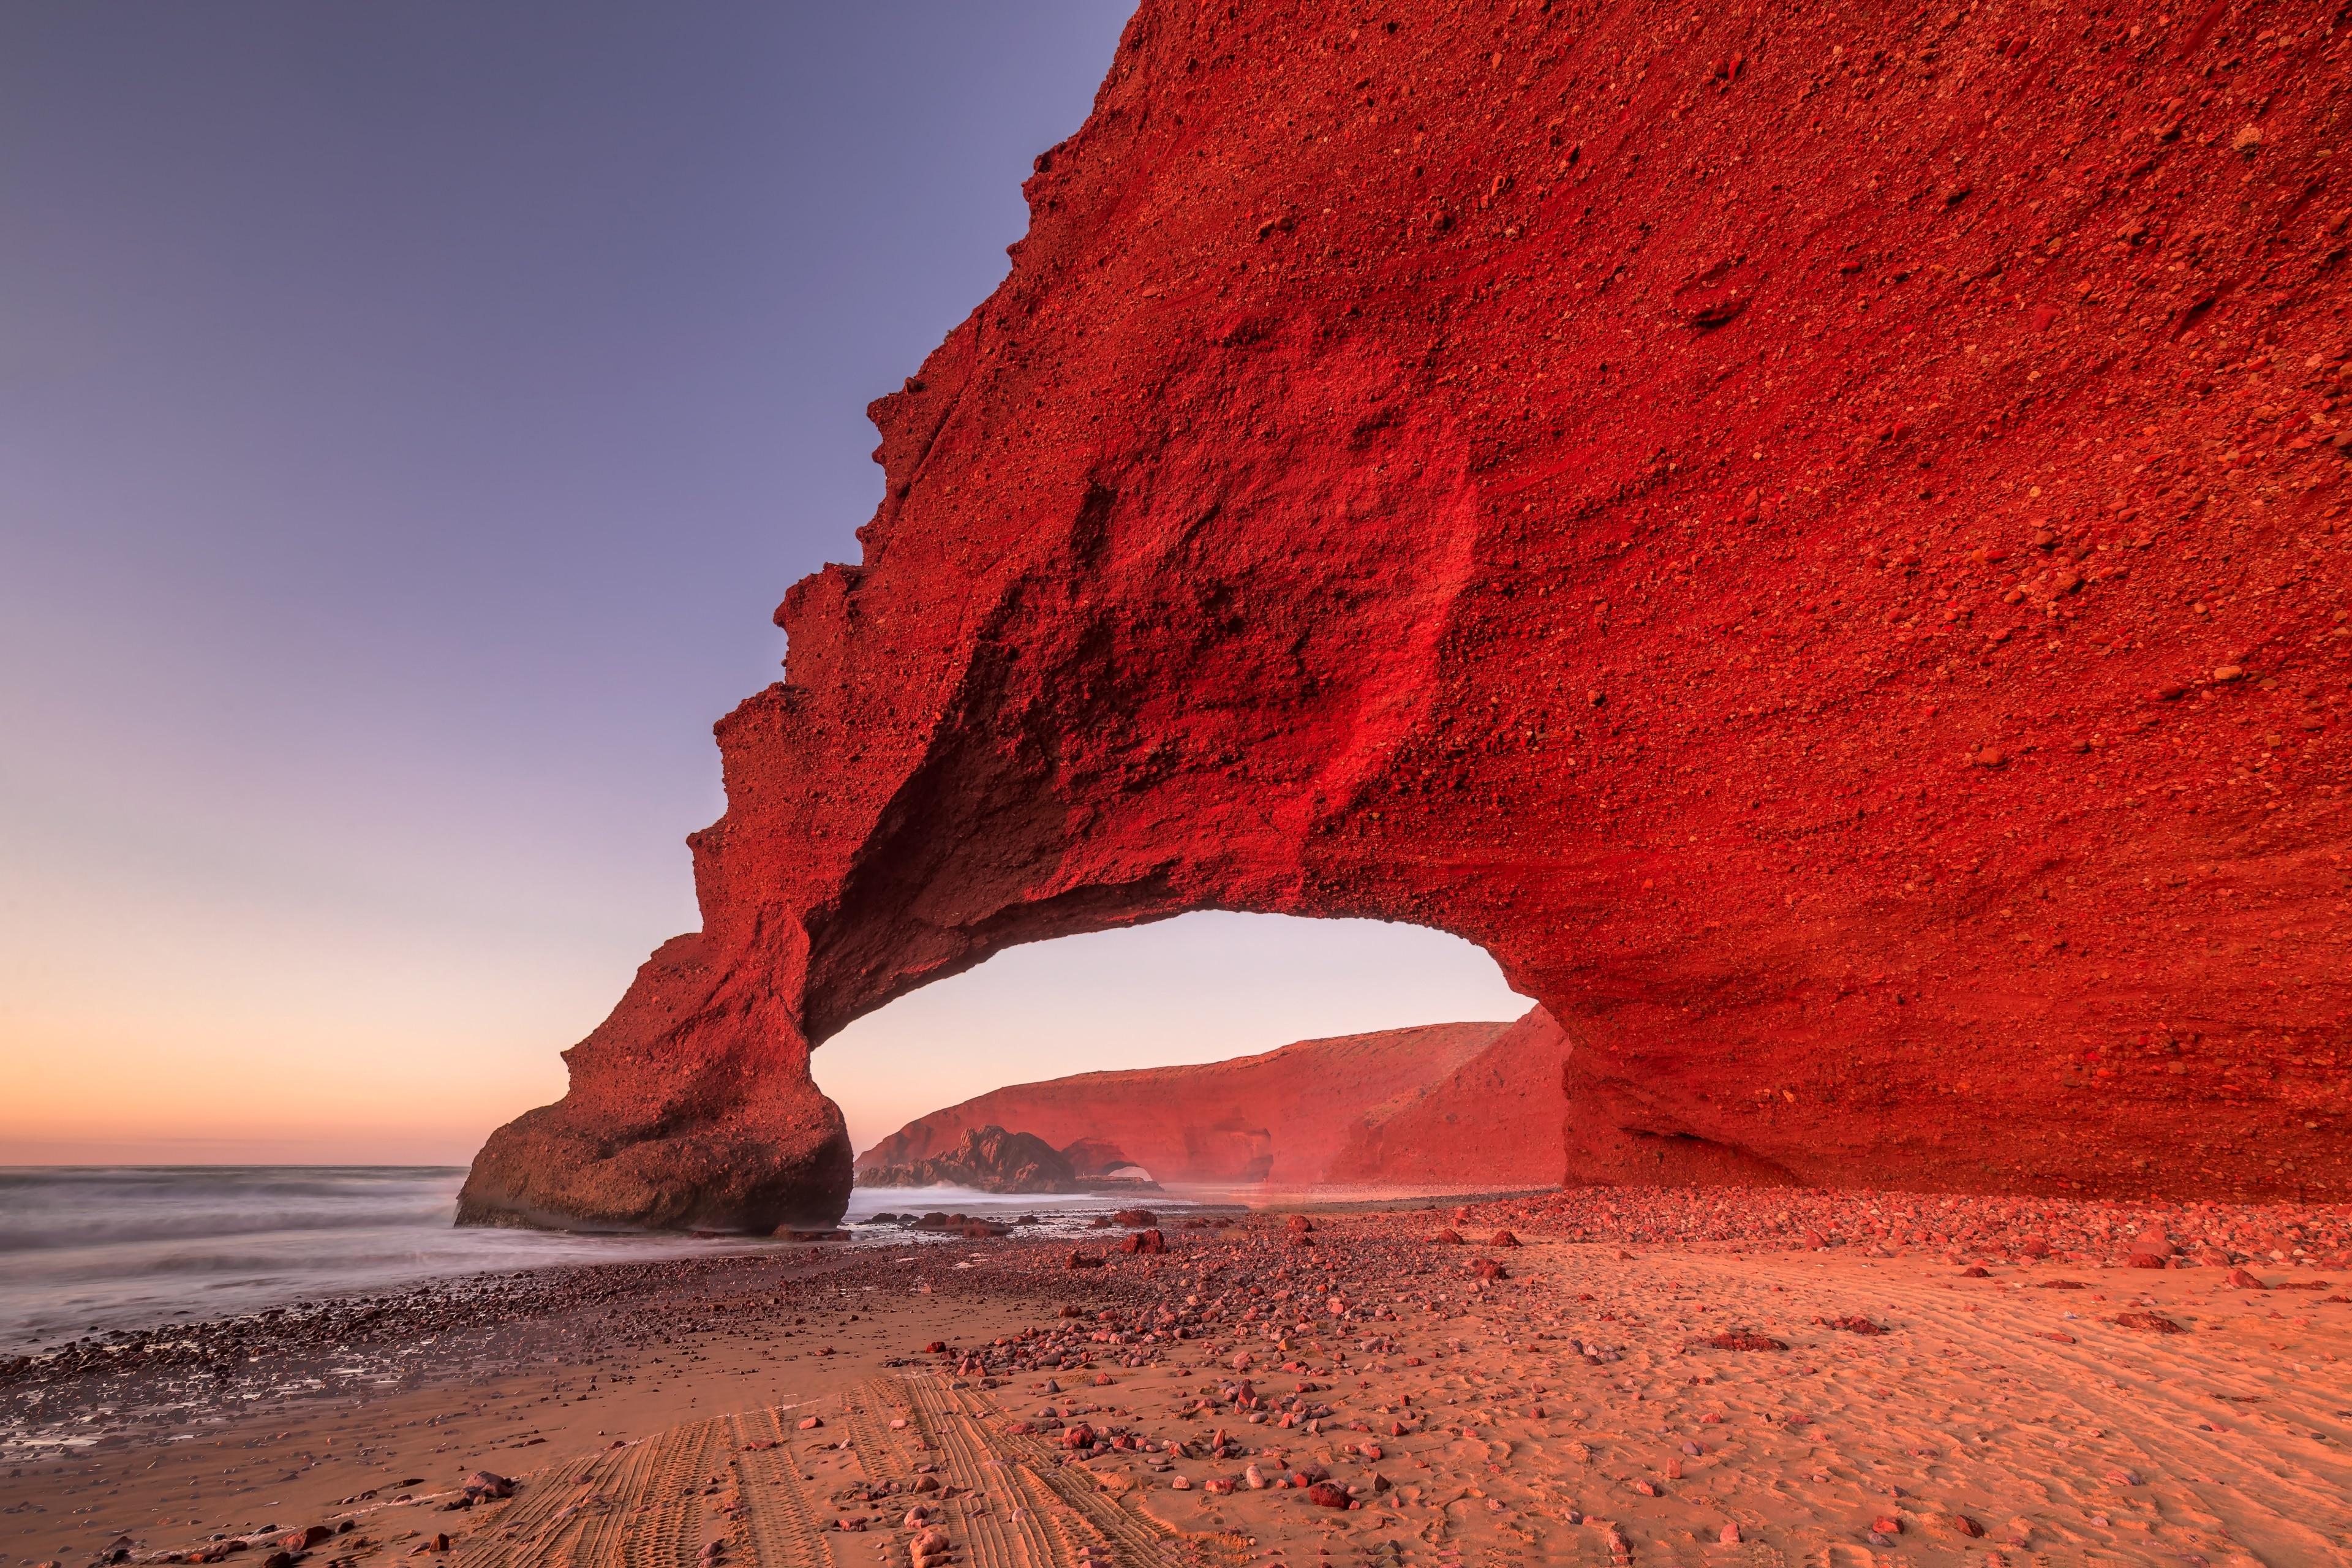 Sidi Ifni, Sidi Ifni, Guelmim-Oued Noun, Marokko